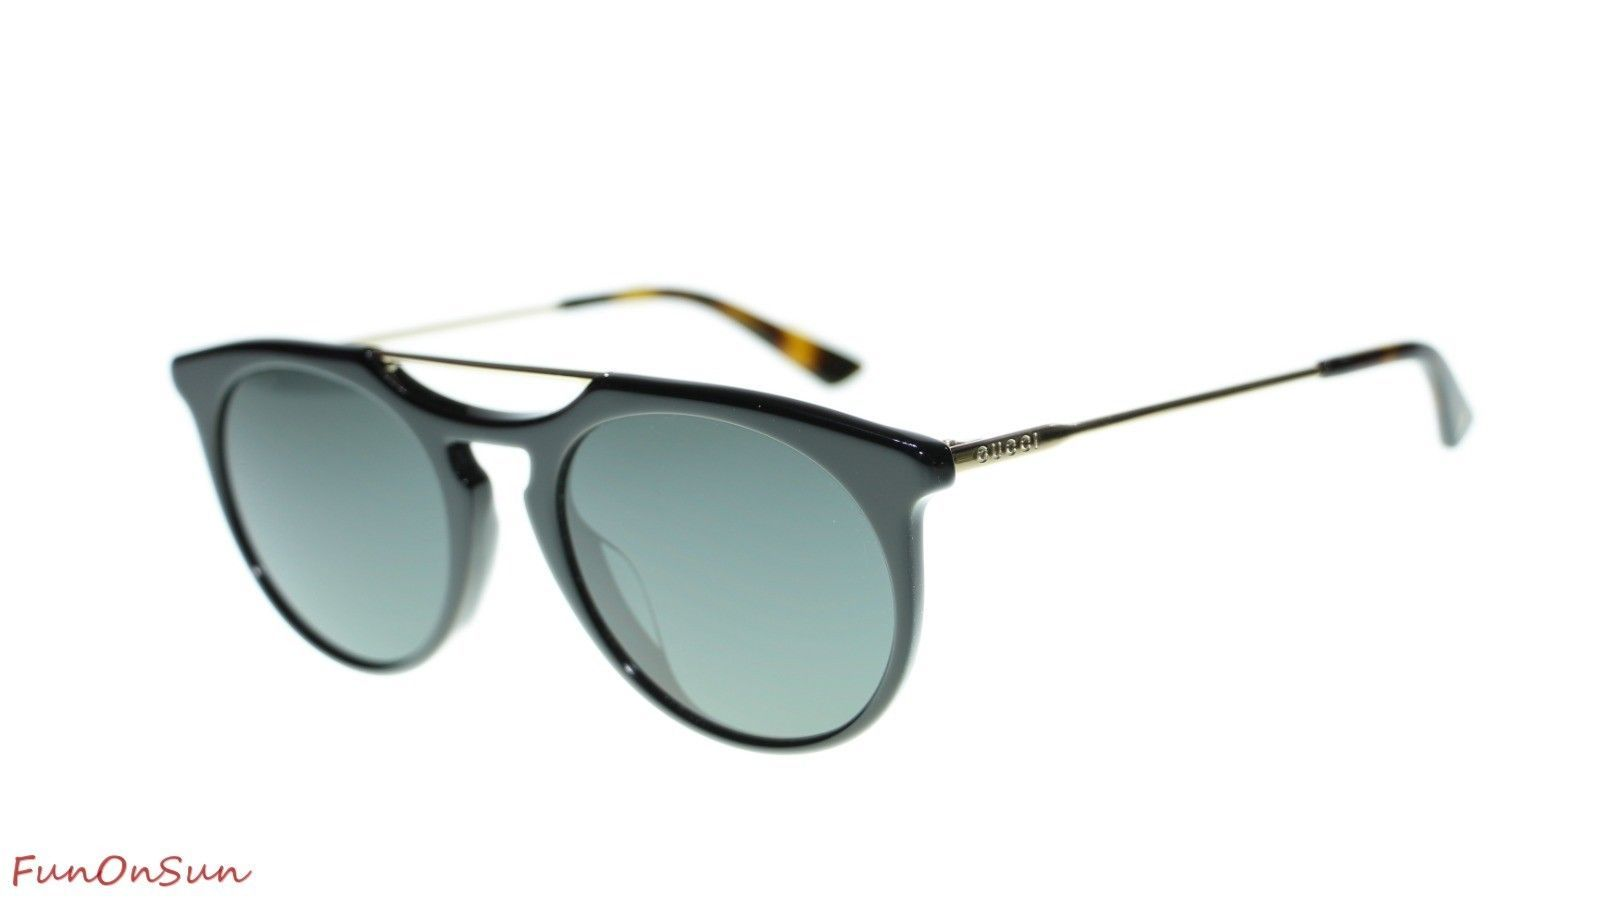 9749f0816f NEW Gucci Men Sunglasses GG0320S 001 Black and 50 similar items. 10